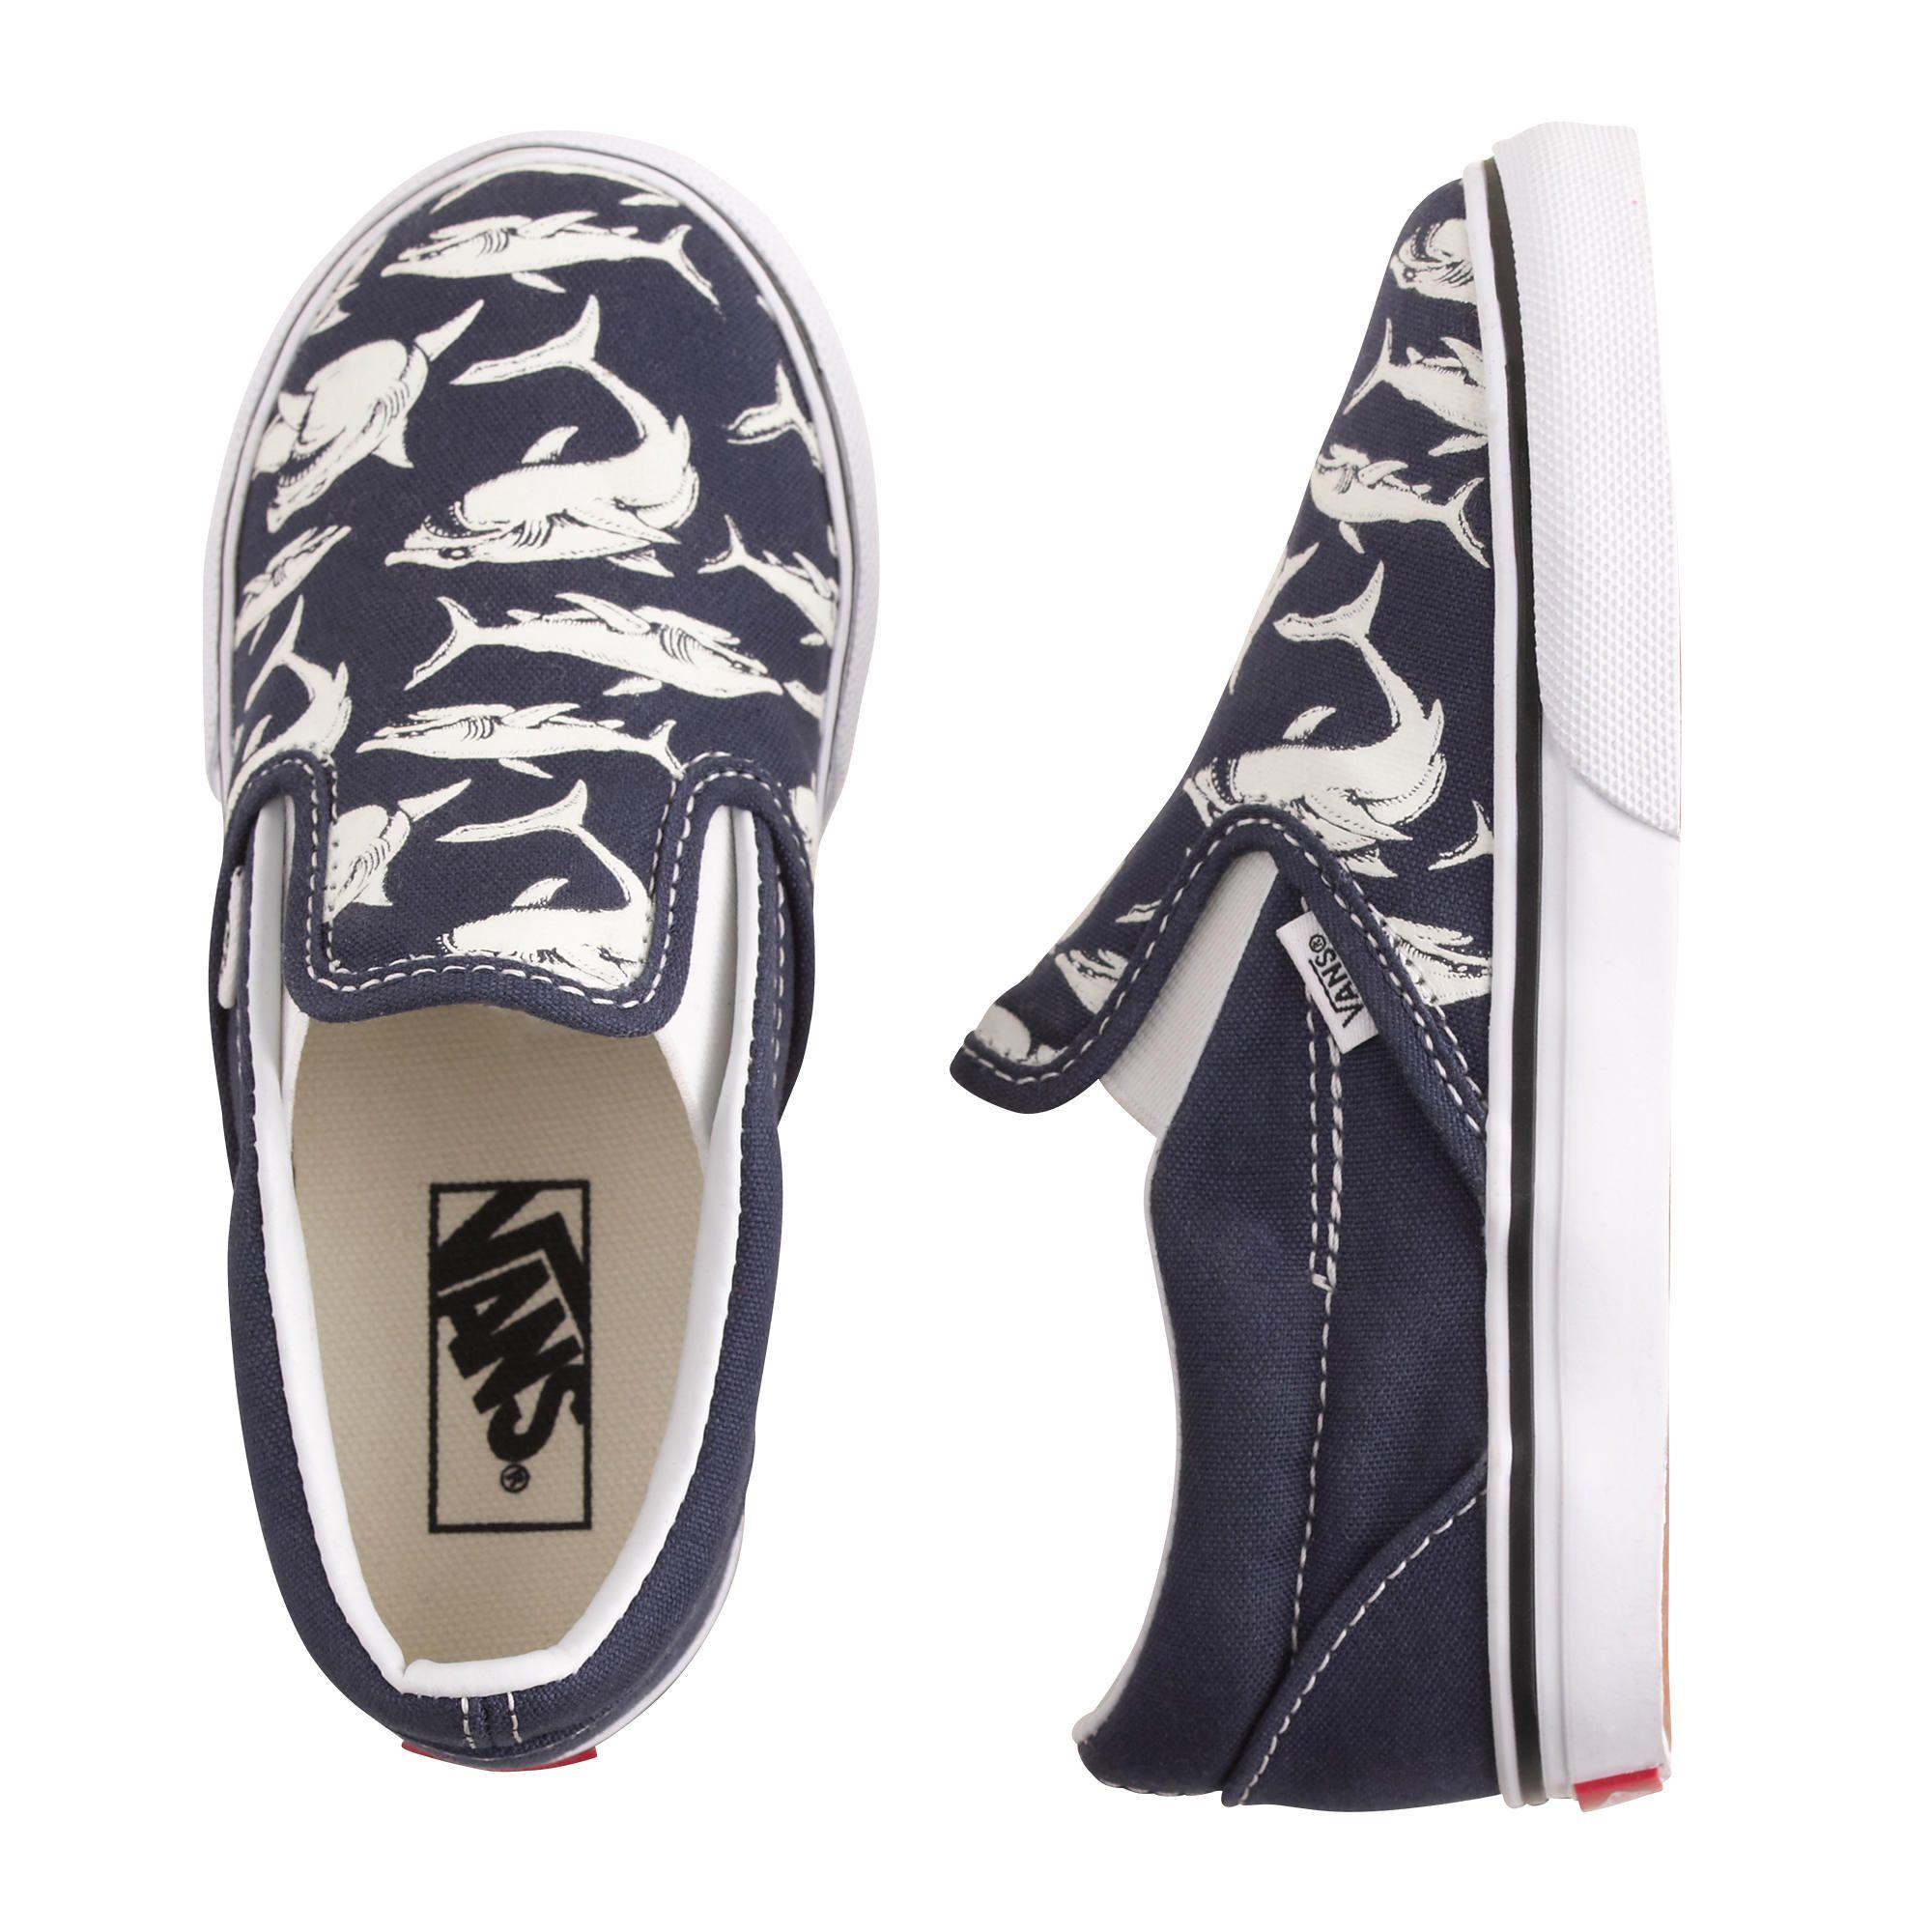 J.Crew | Shark shoes, Boys shoes